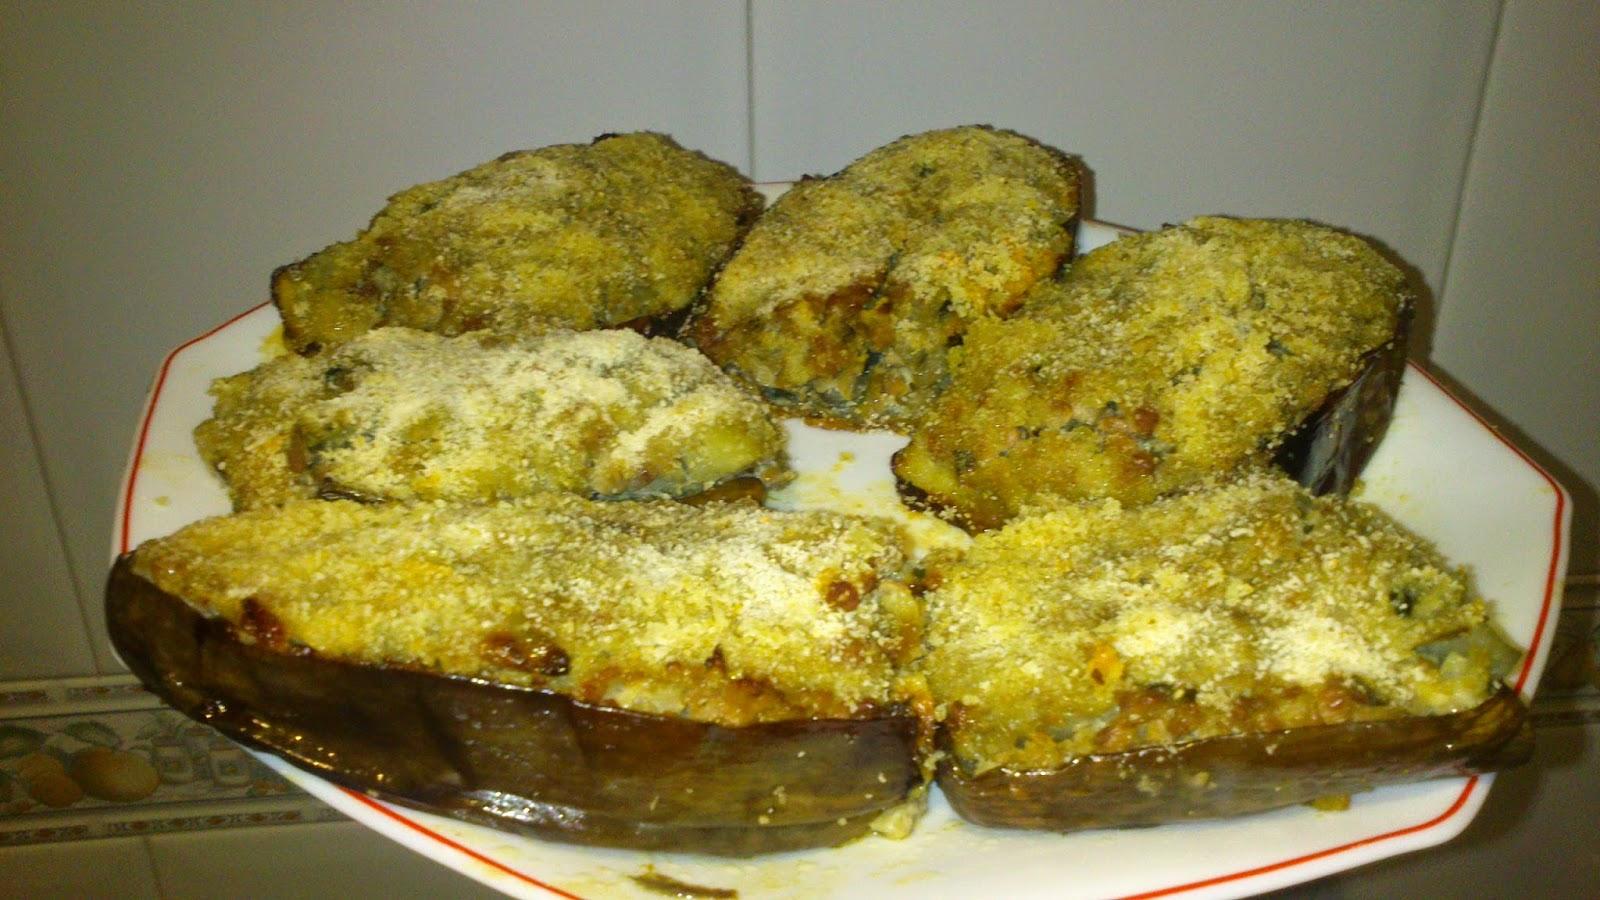 Cocina facil berenjenas rellenas de carne picada for Cocina berenjenas rellenas